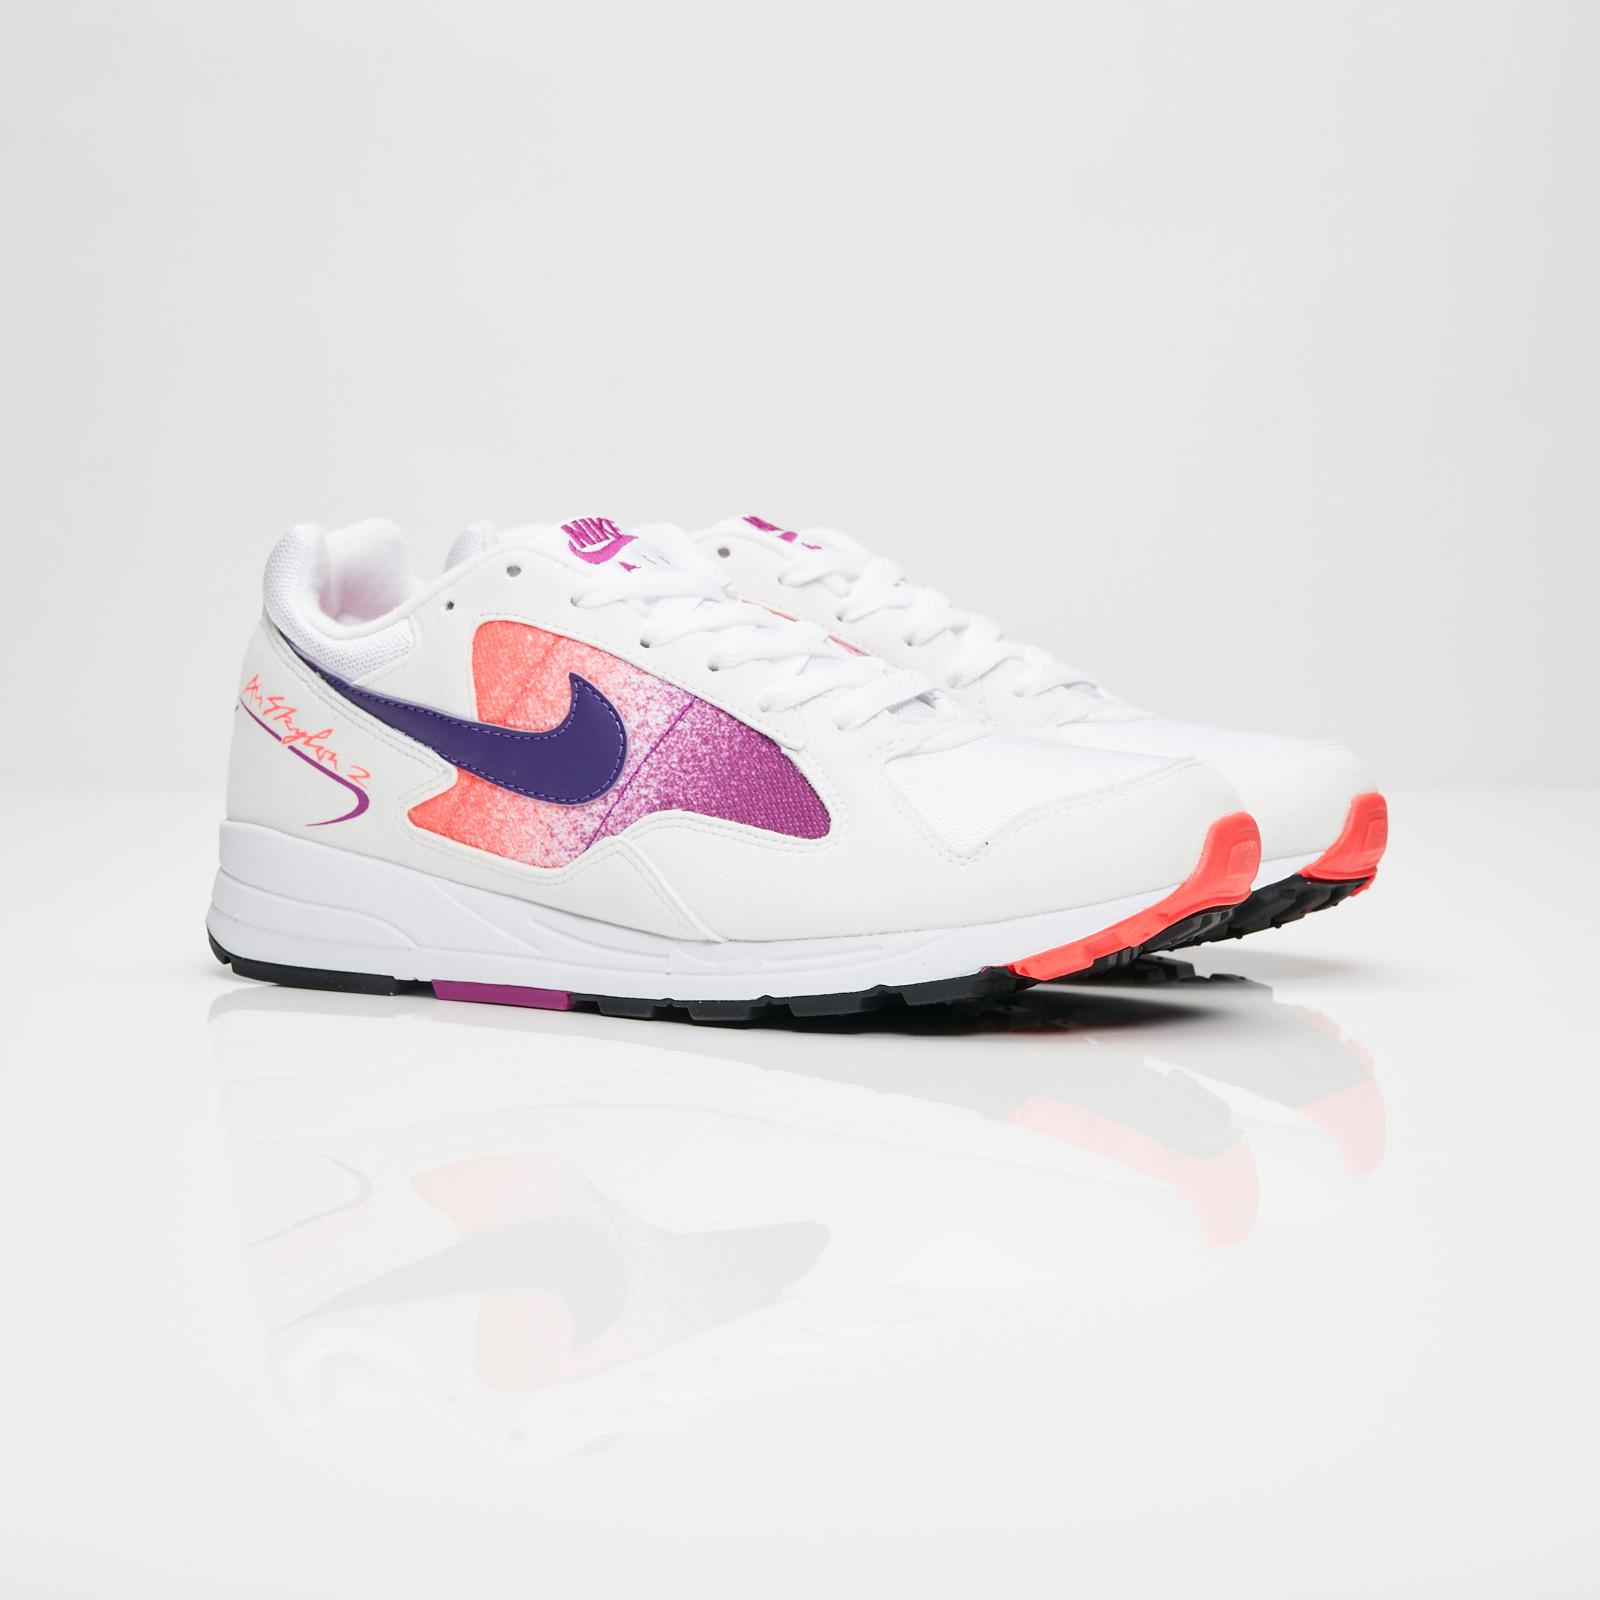 competitive price 1f6e9 ecf4f Nike Sportswear Air Skylon II